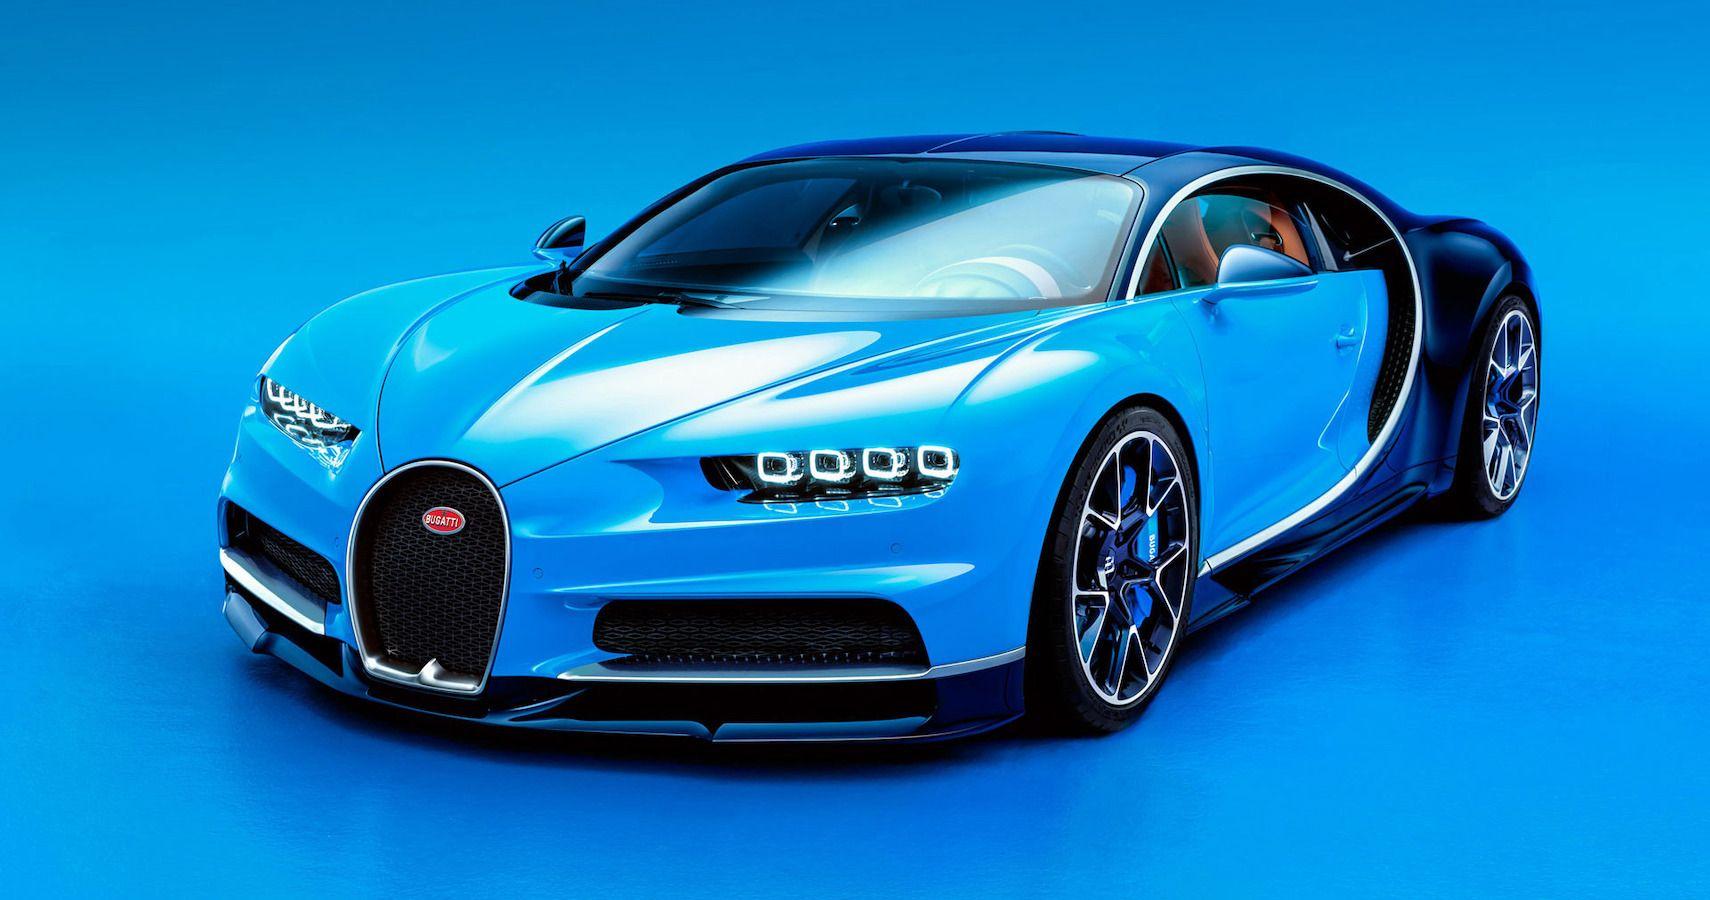 2020 Was Bugatti's Best Year Ever Despite The Pandemic | HotCars